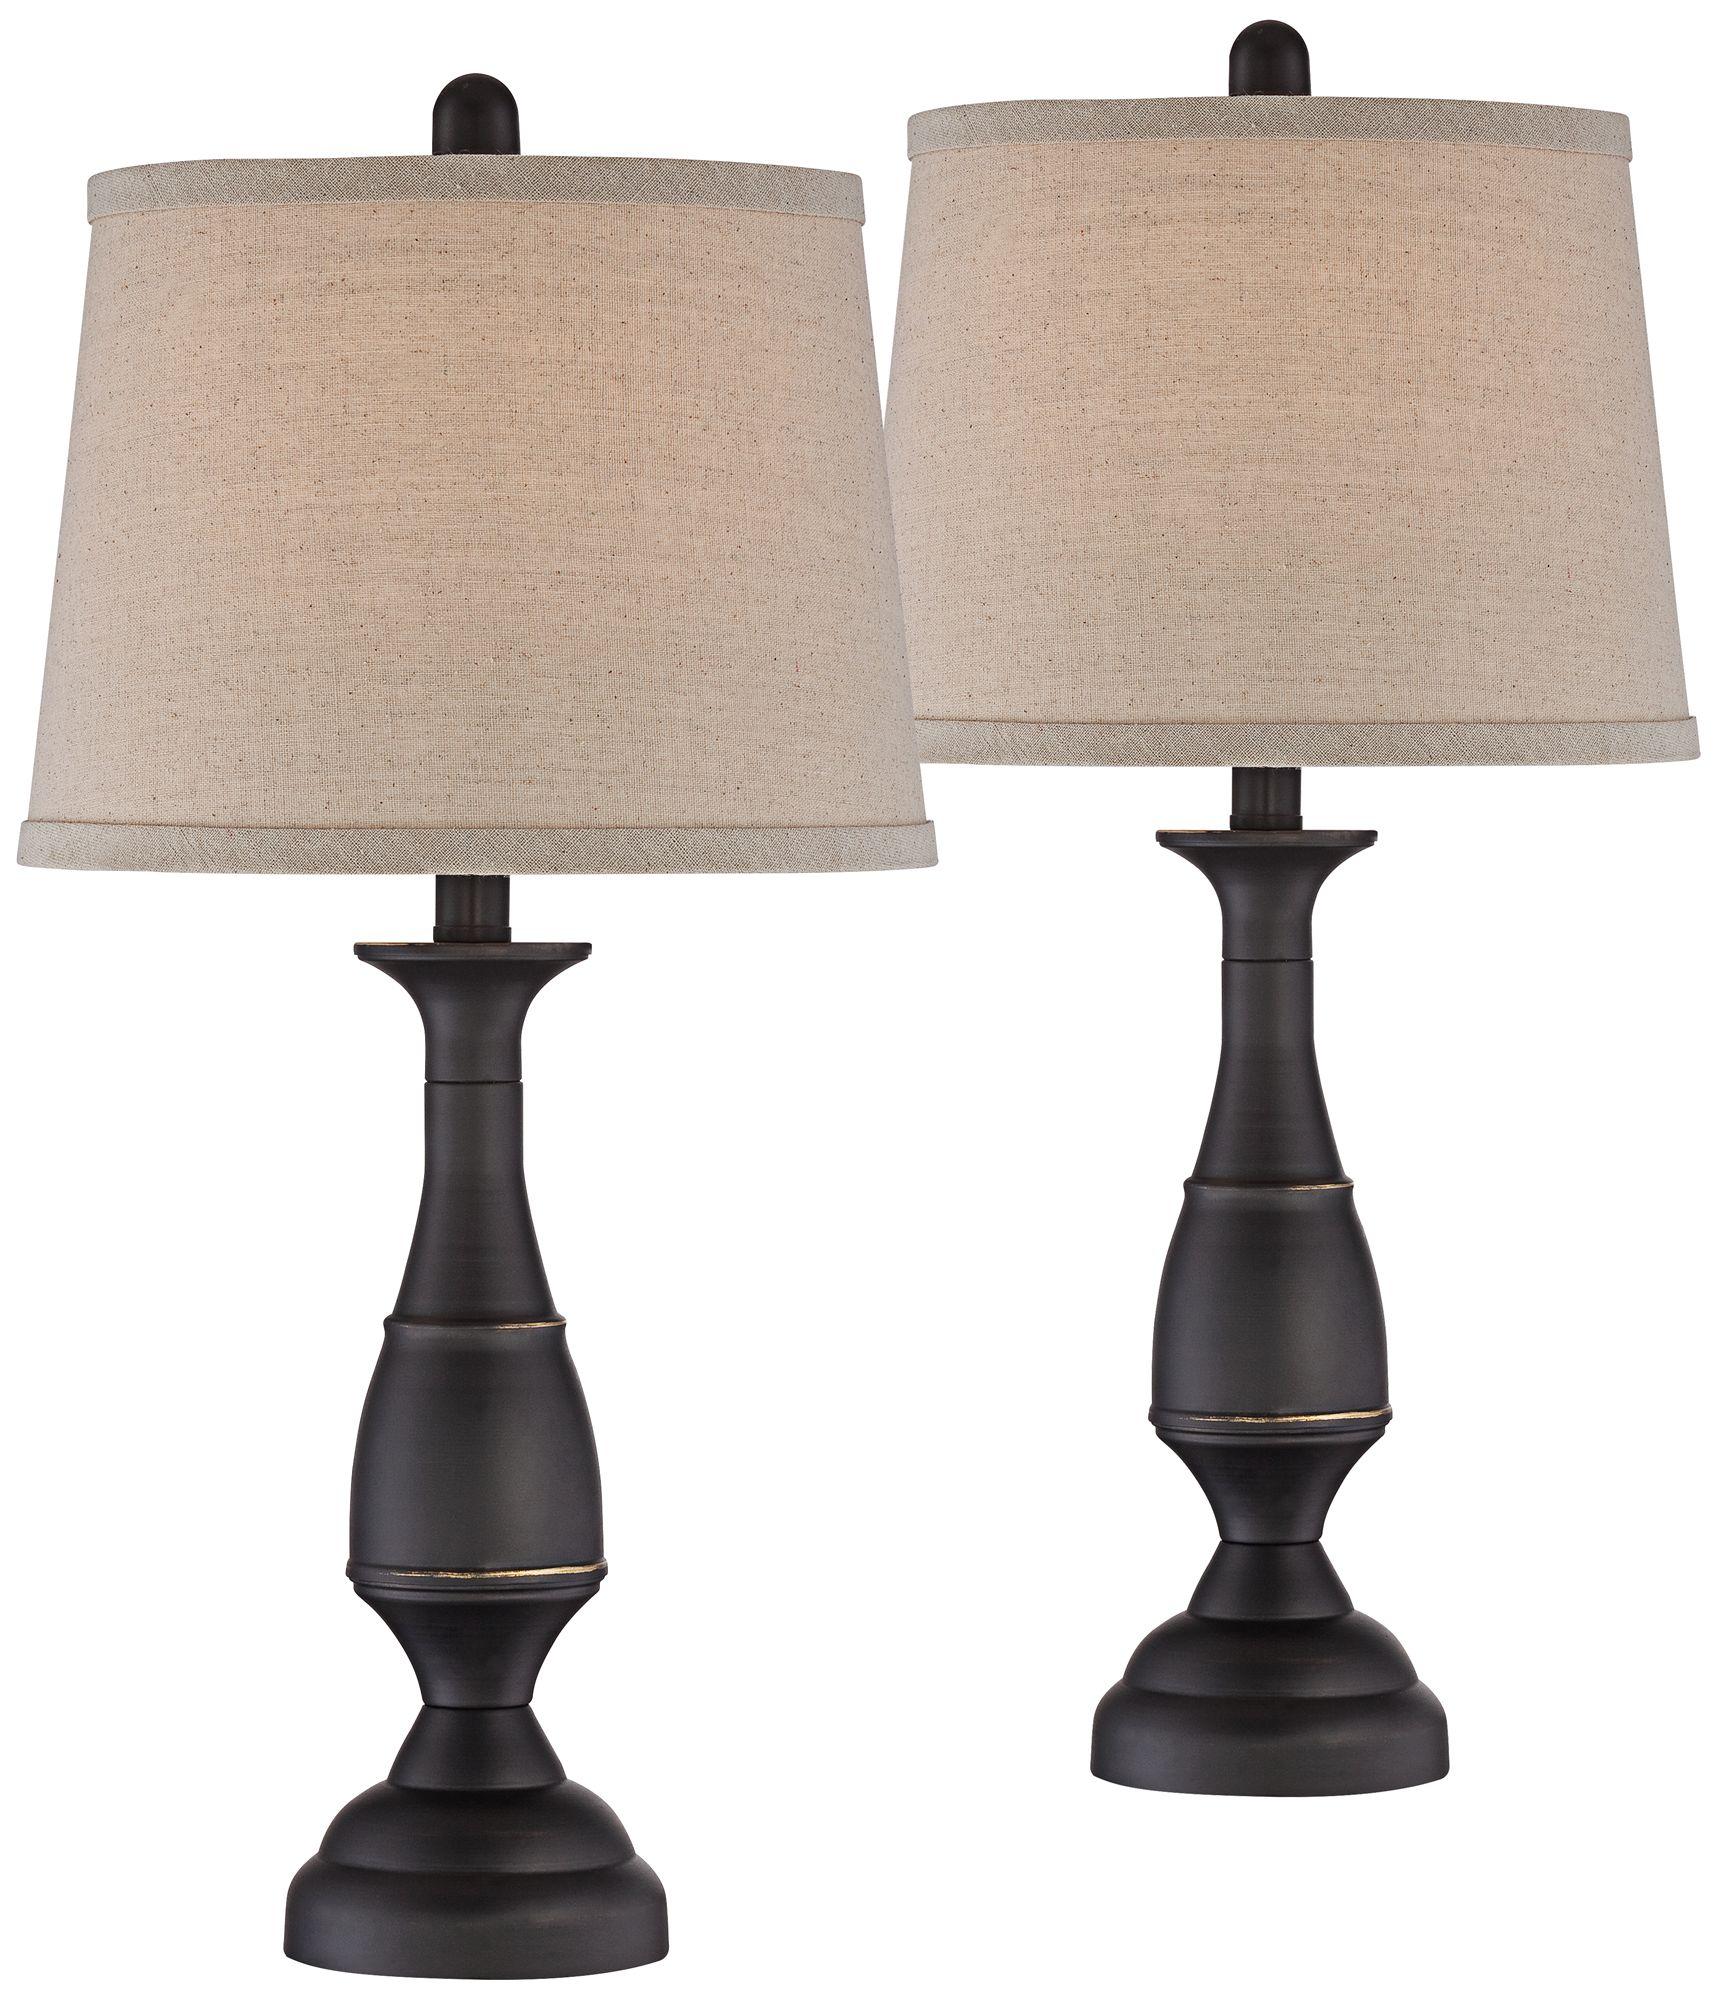 Attirant Ben Dark Bronze Metal Table Lamp Set Of 2